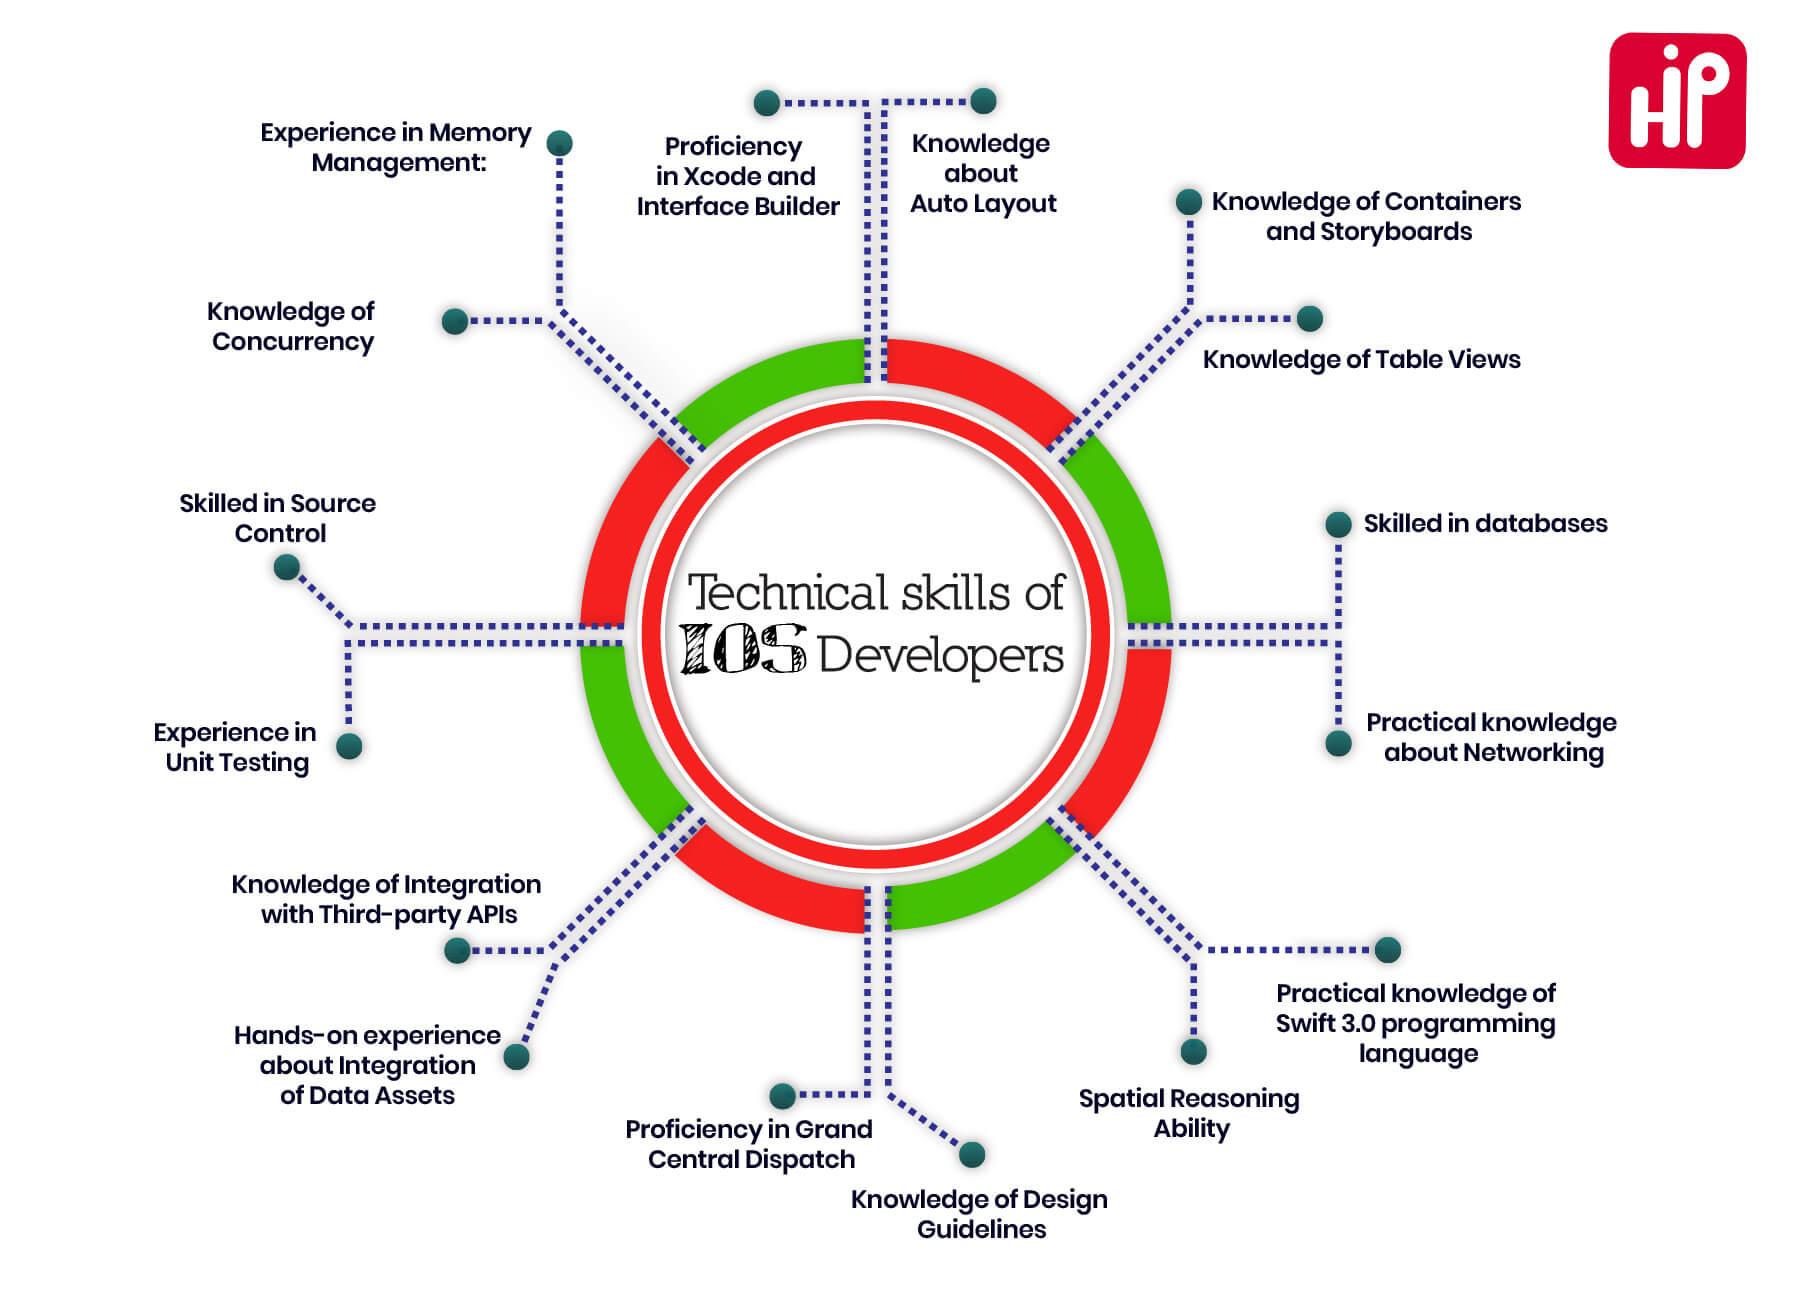 Top iOS developer skills - 16 technical skills